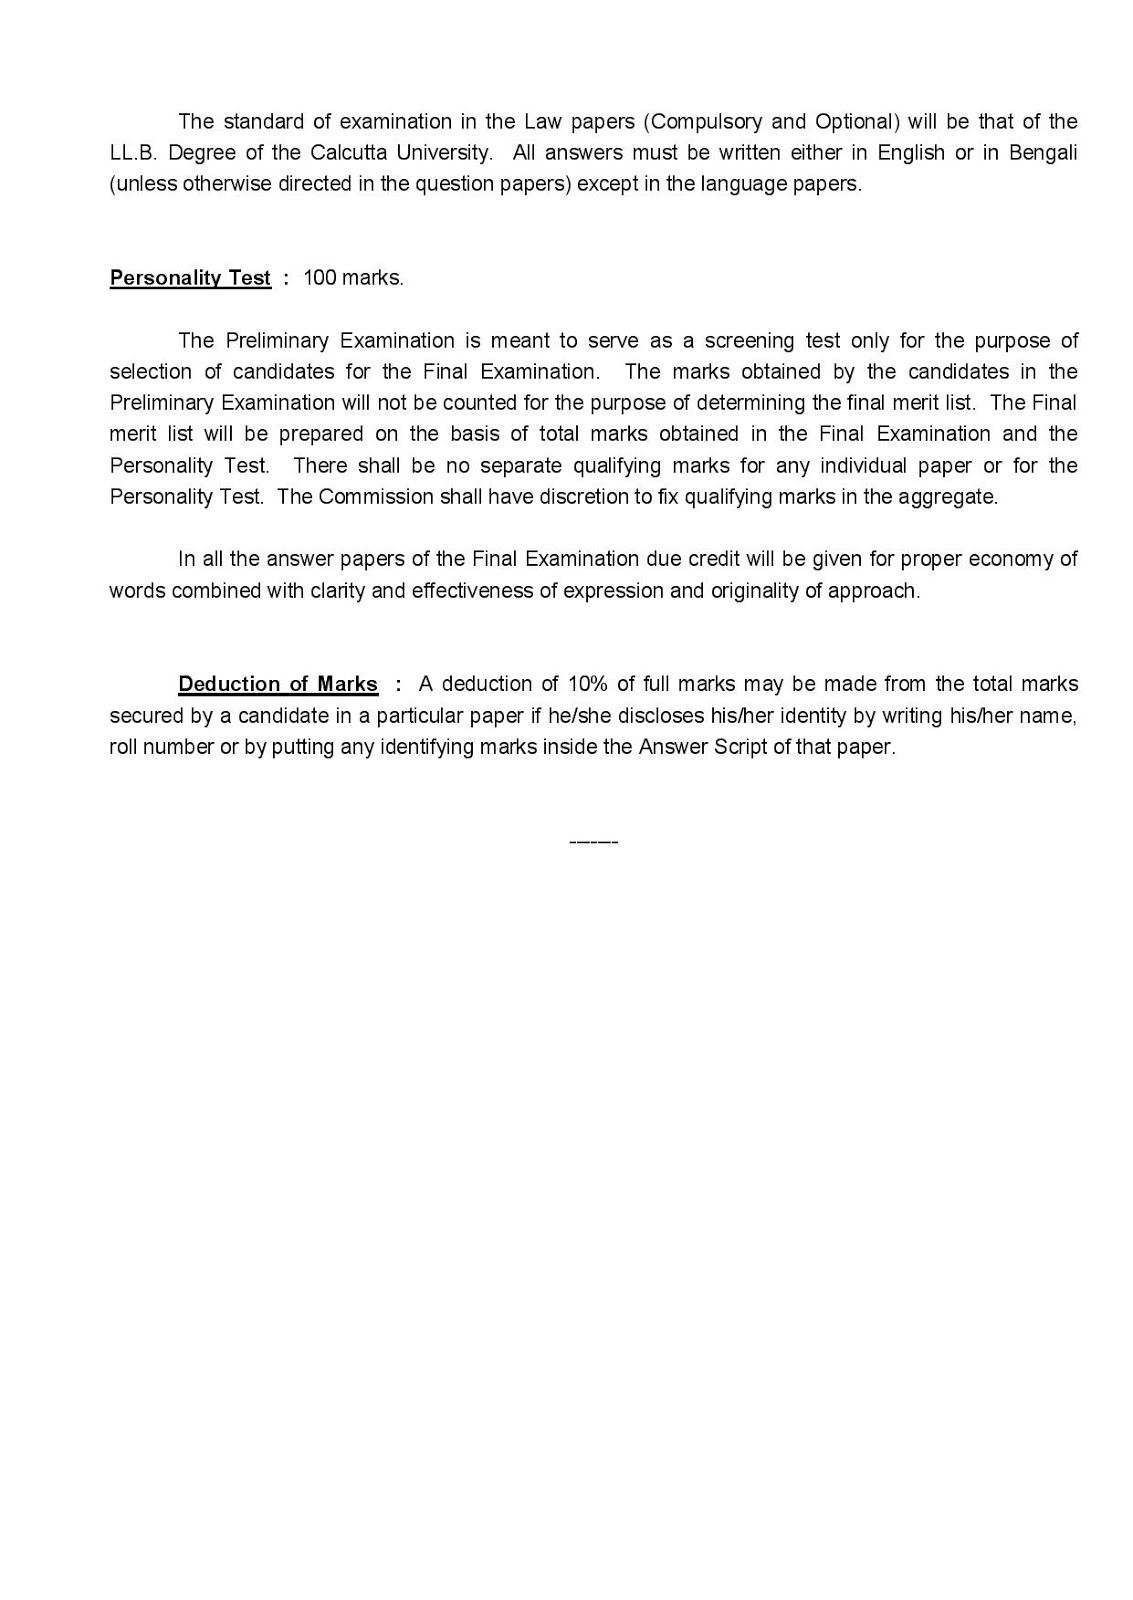 ASSAM TRIPURA WEST BENGAL JUDICIAL SERVICE WBJS COACHING CENTRE IN